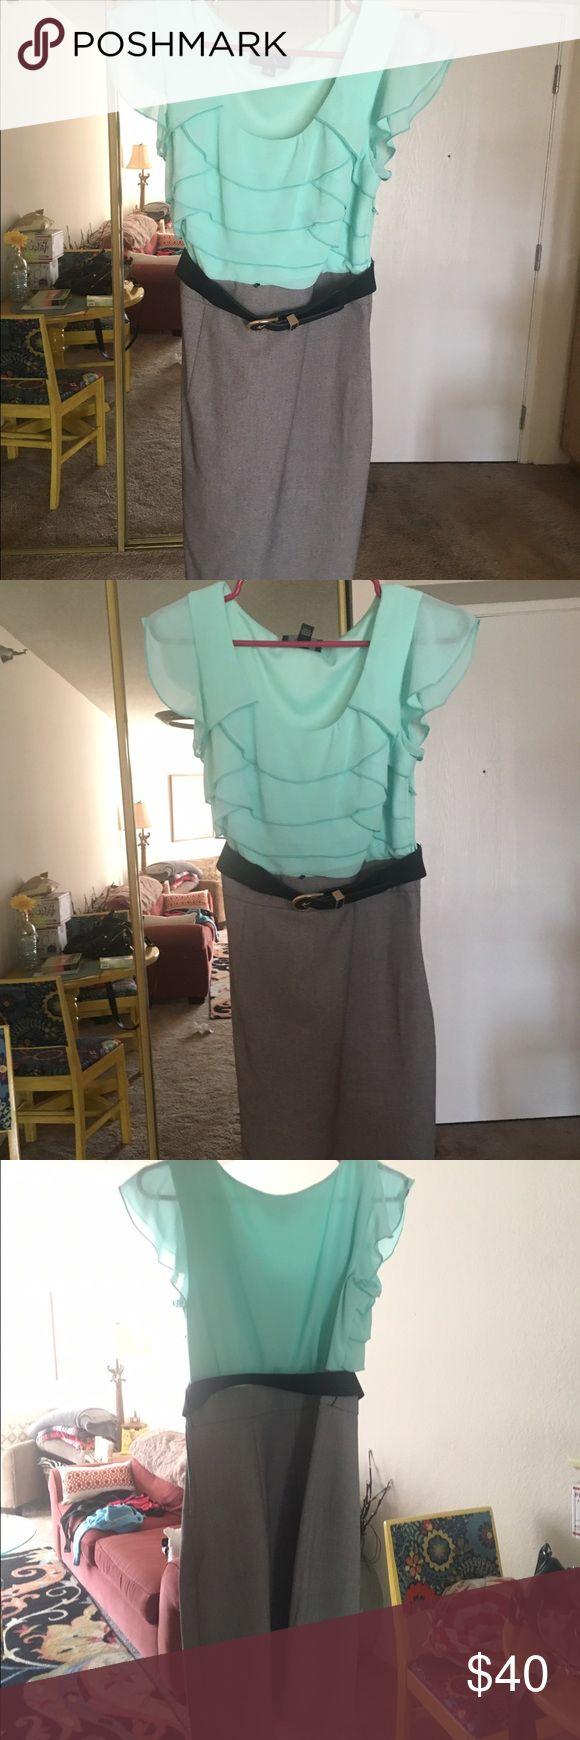 Cute business professional dress w/ belt Cute business professional dress w/ belt never worn Dresses Midi